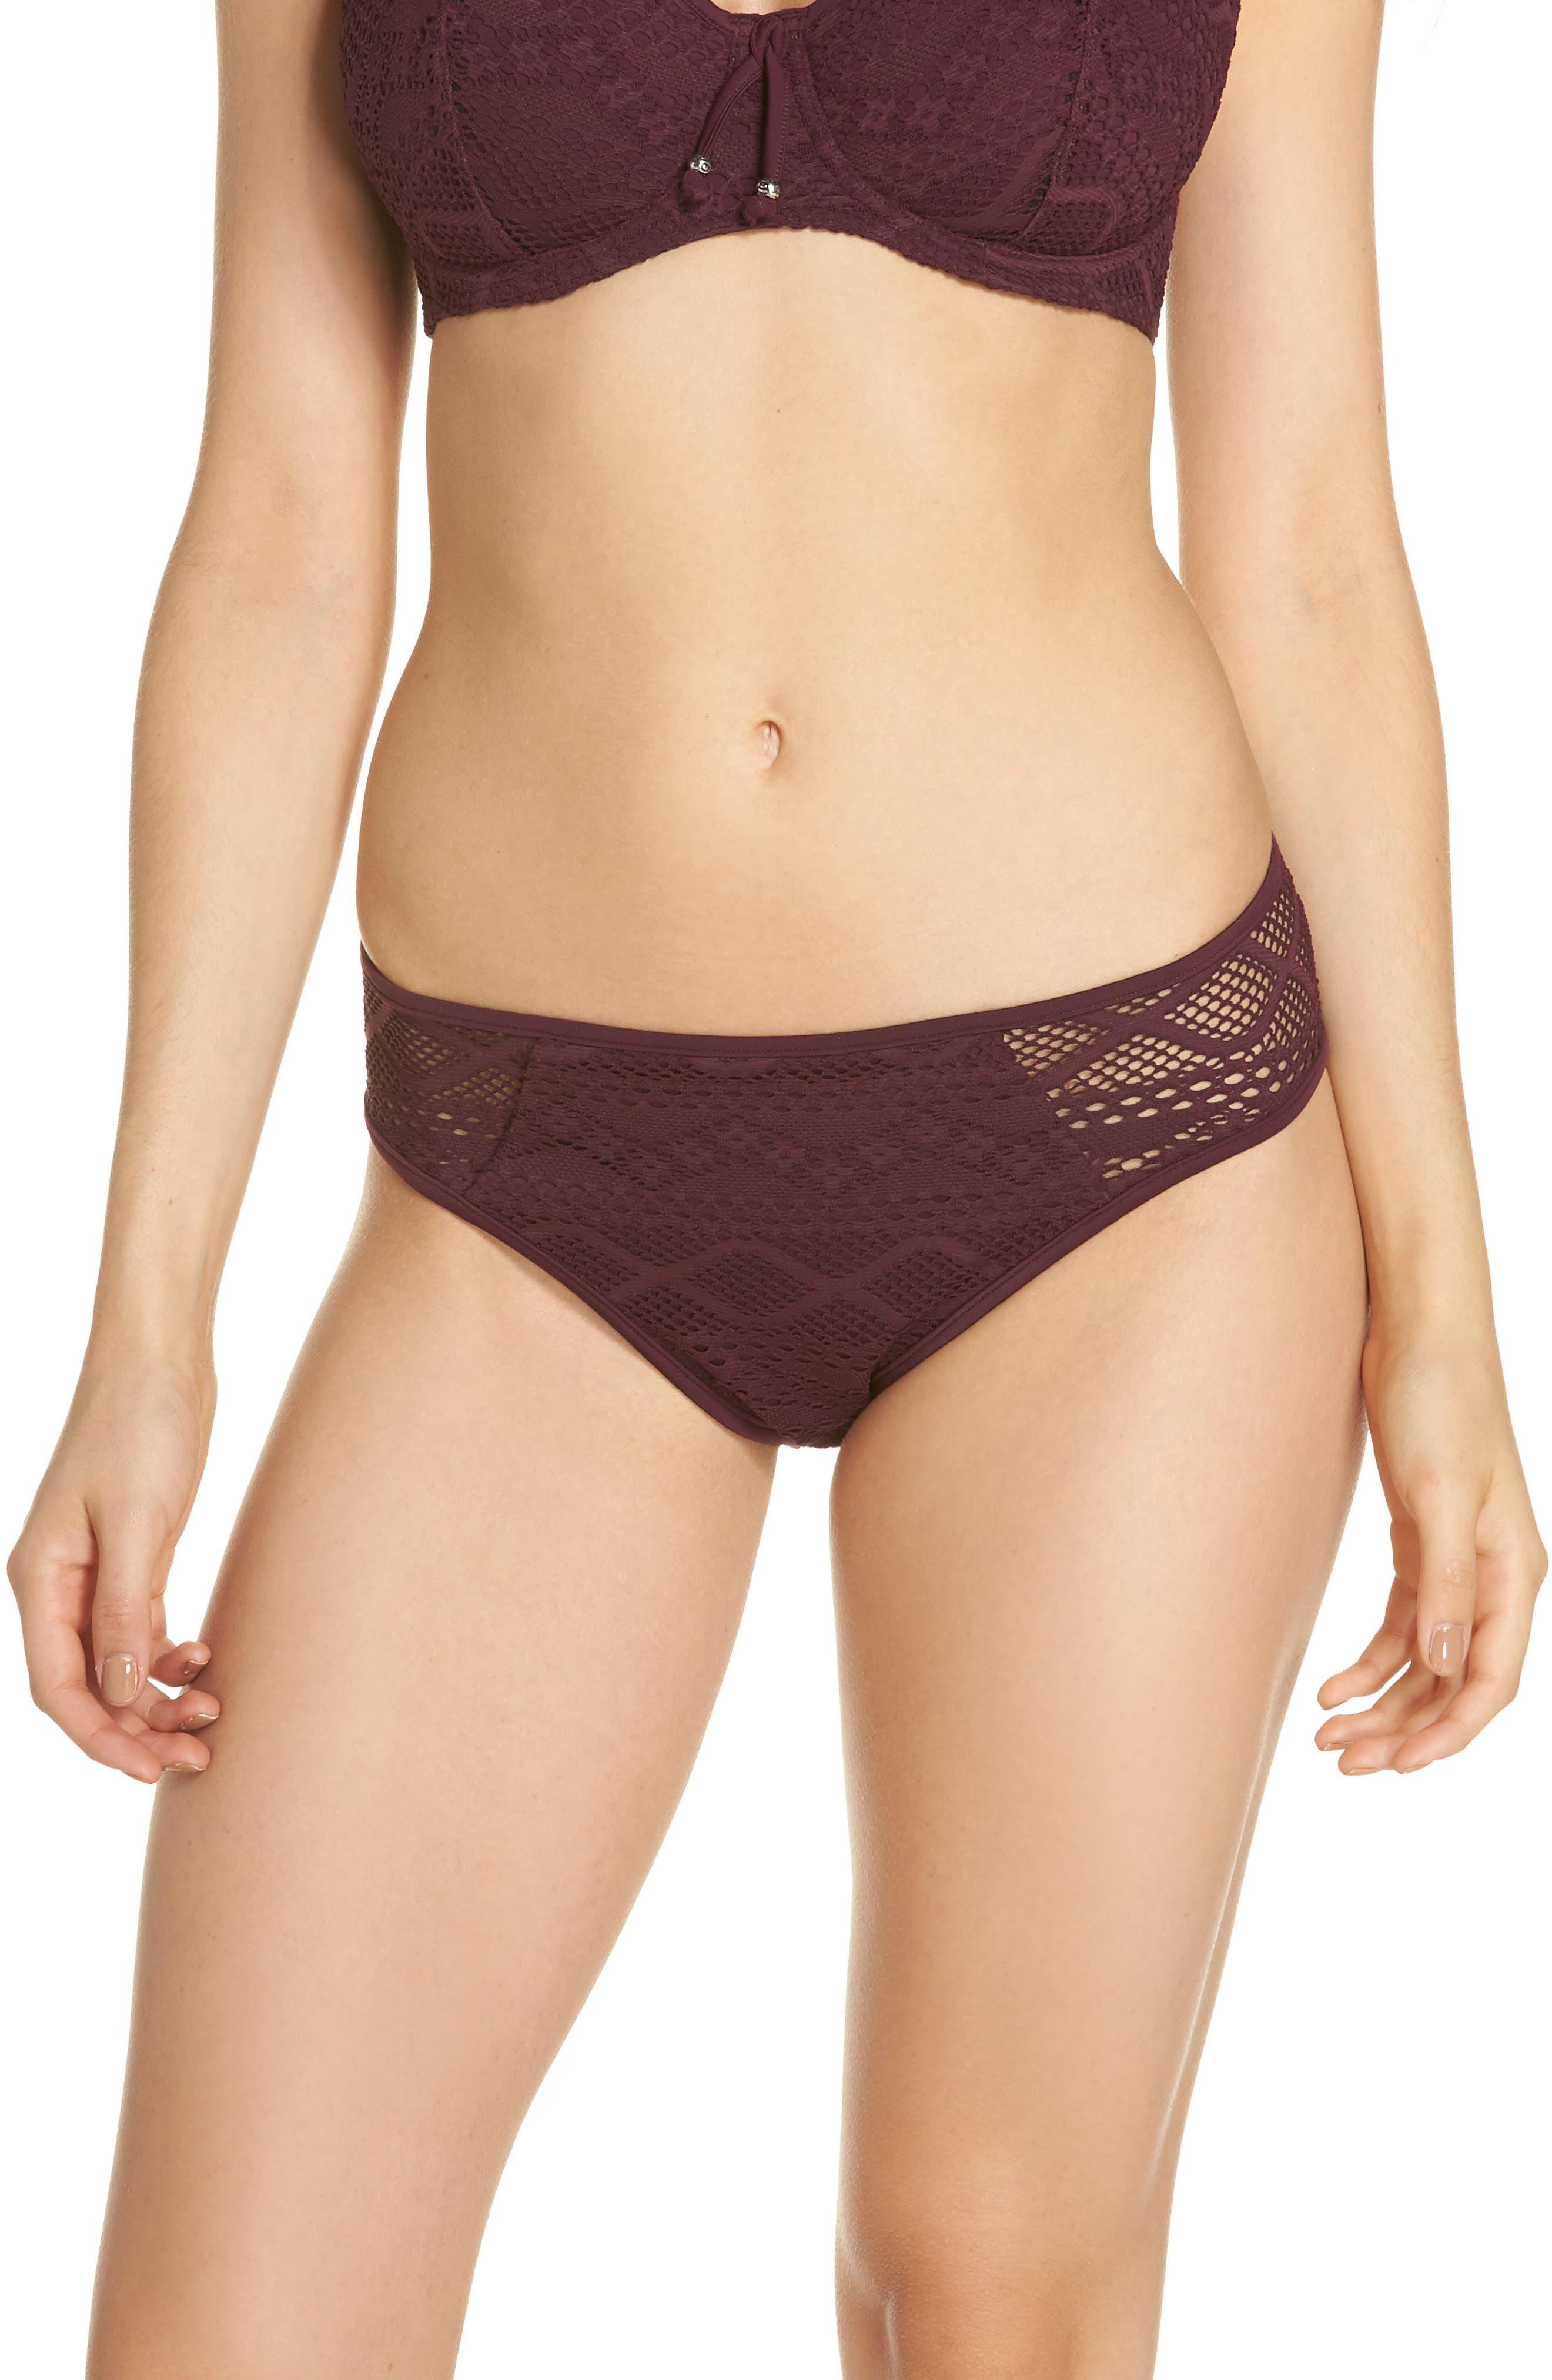 FREYA 'Sundance' Crochet Hipster Bikini Bottoms in Black Cherry